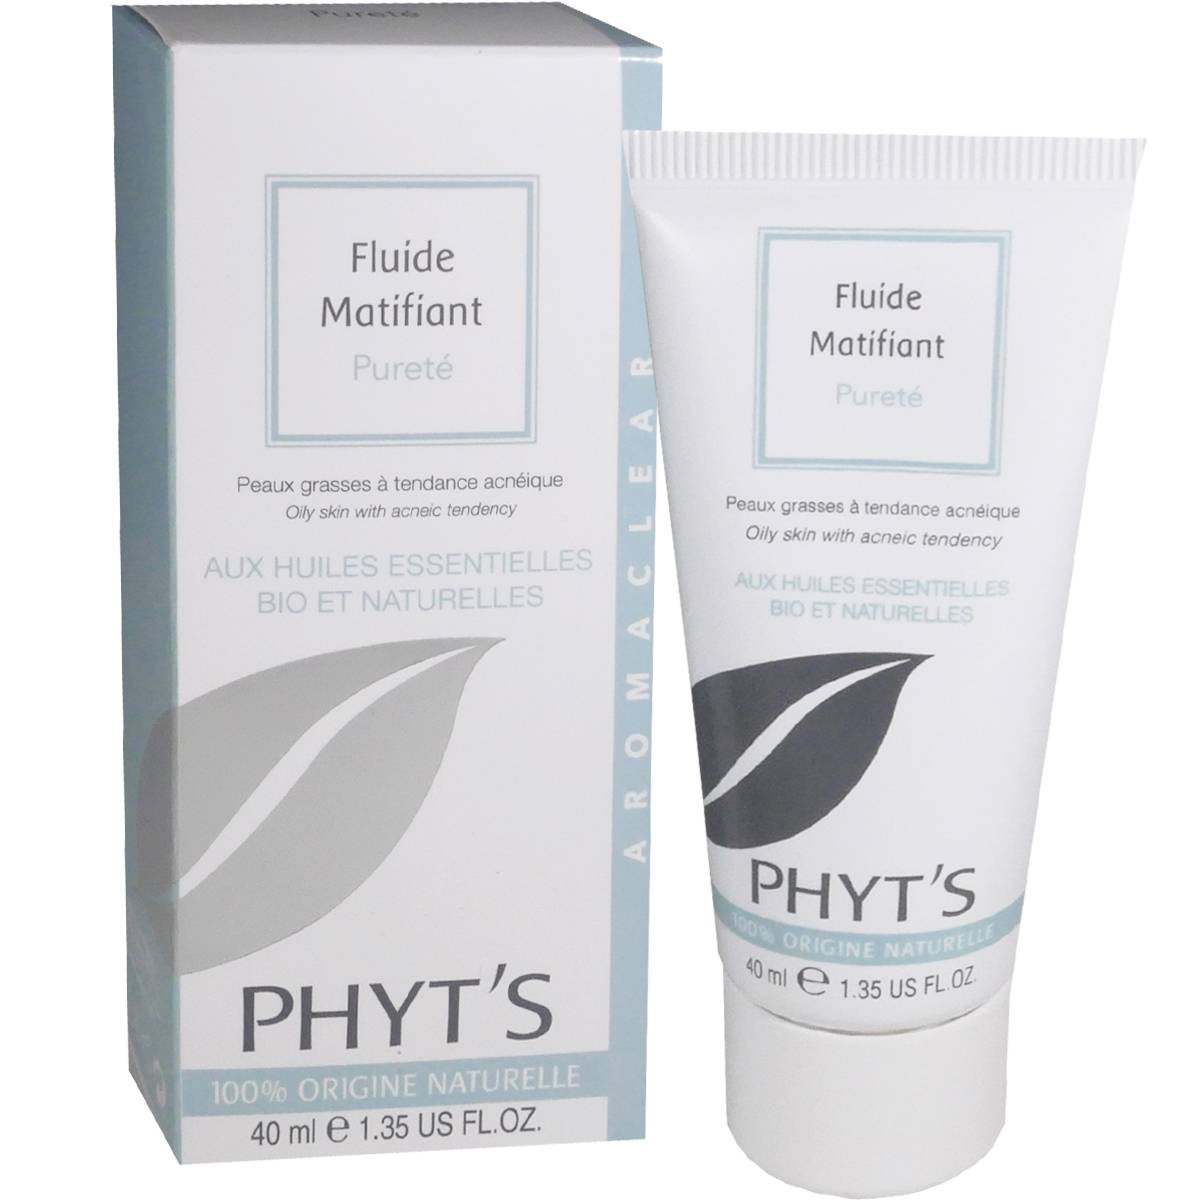 Phyt's fluide matifiant purete 40 ml huiles essentielles